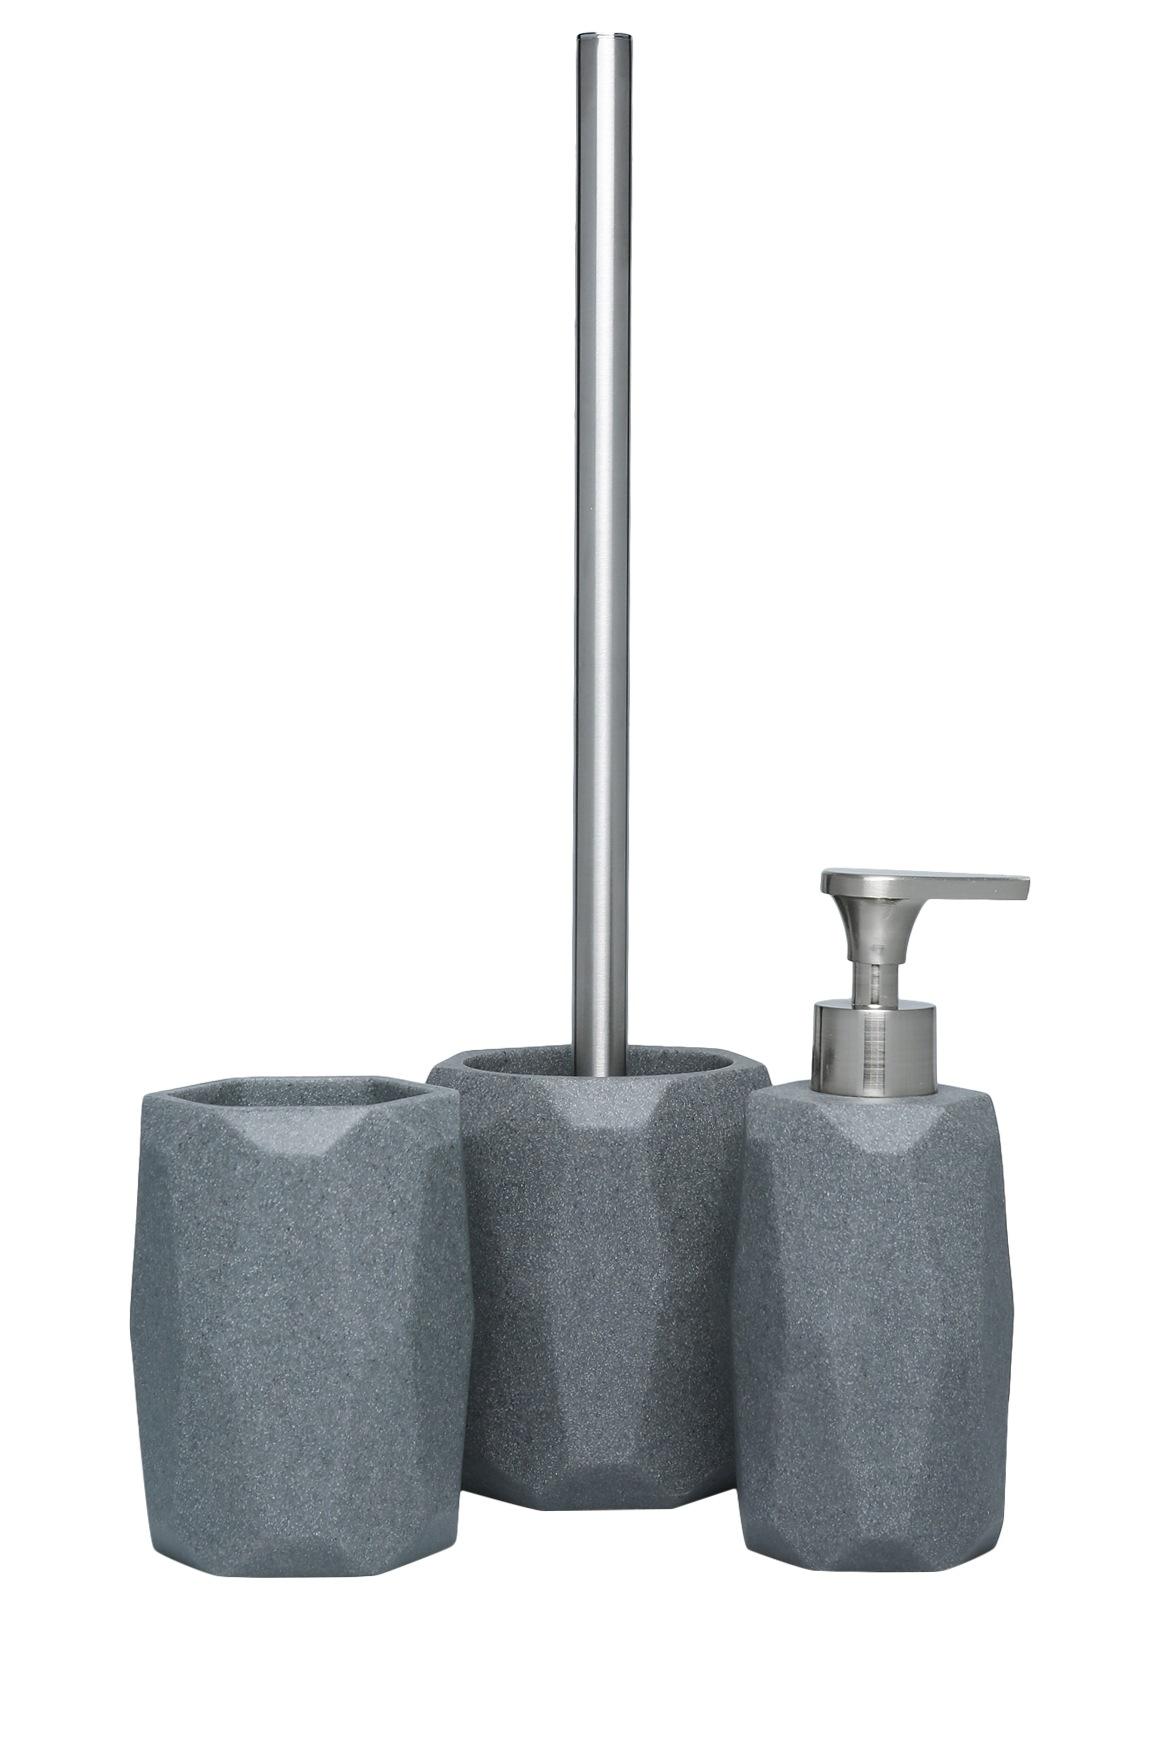 Myer bathroom accessories - Myer Bathroom Accessories 1